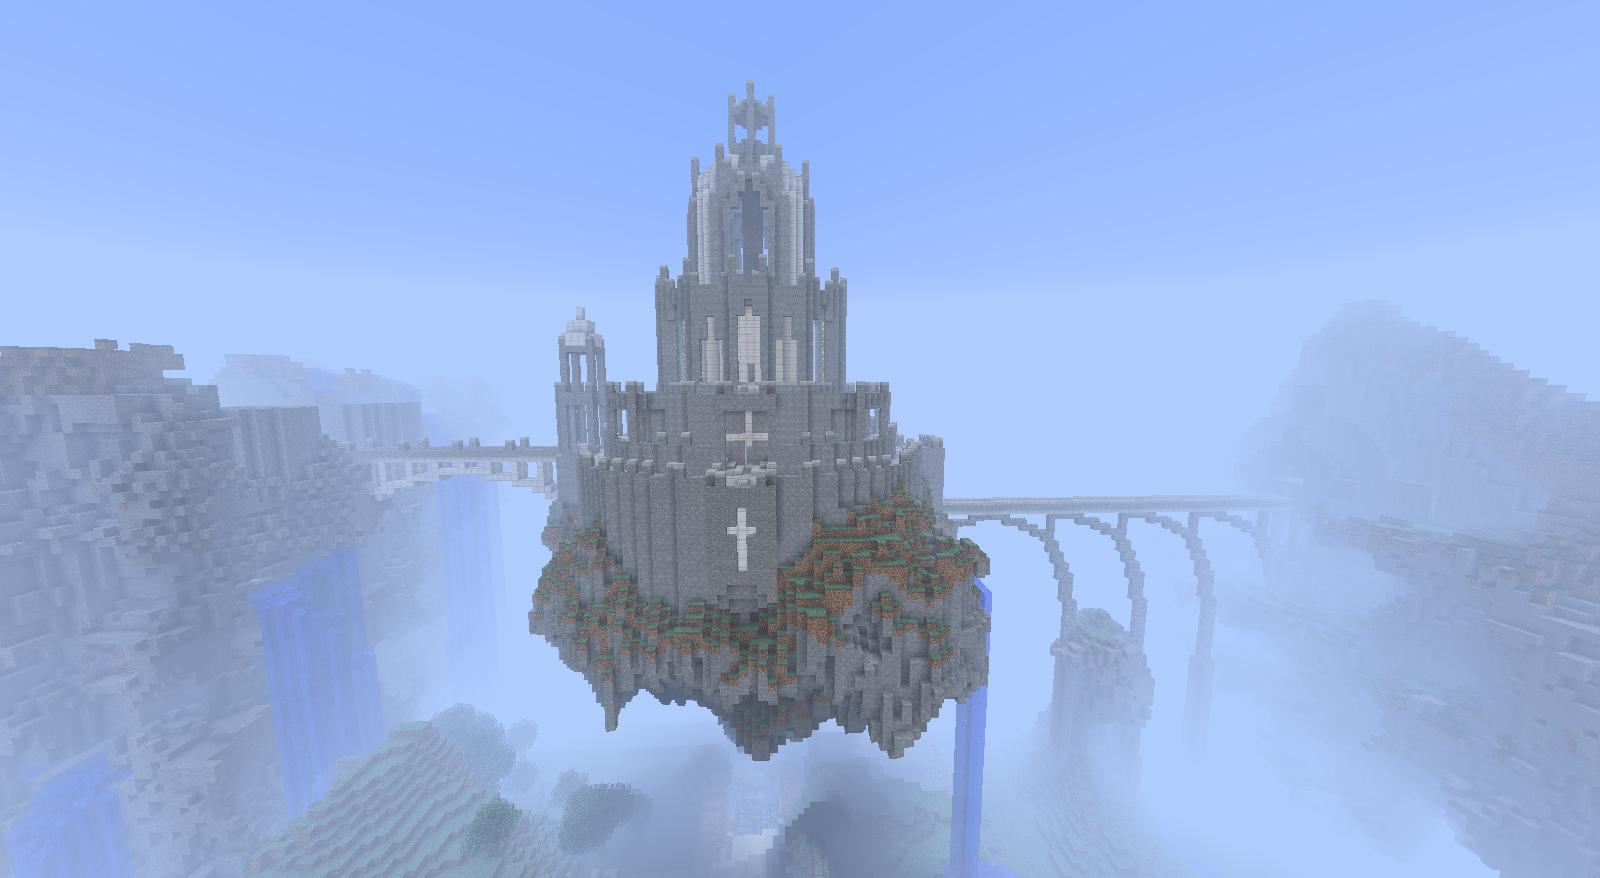 The Minecraft Castle: September 2012